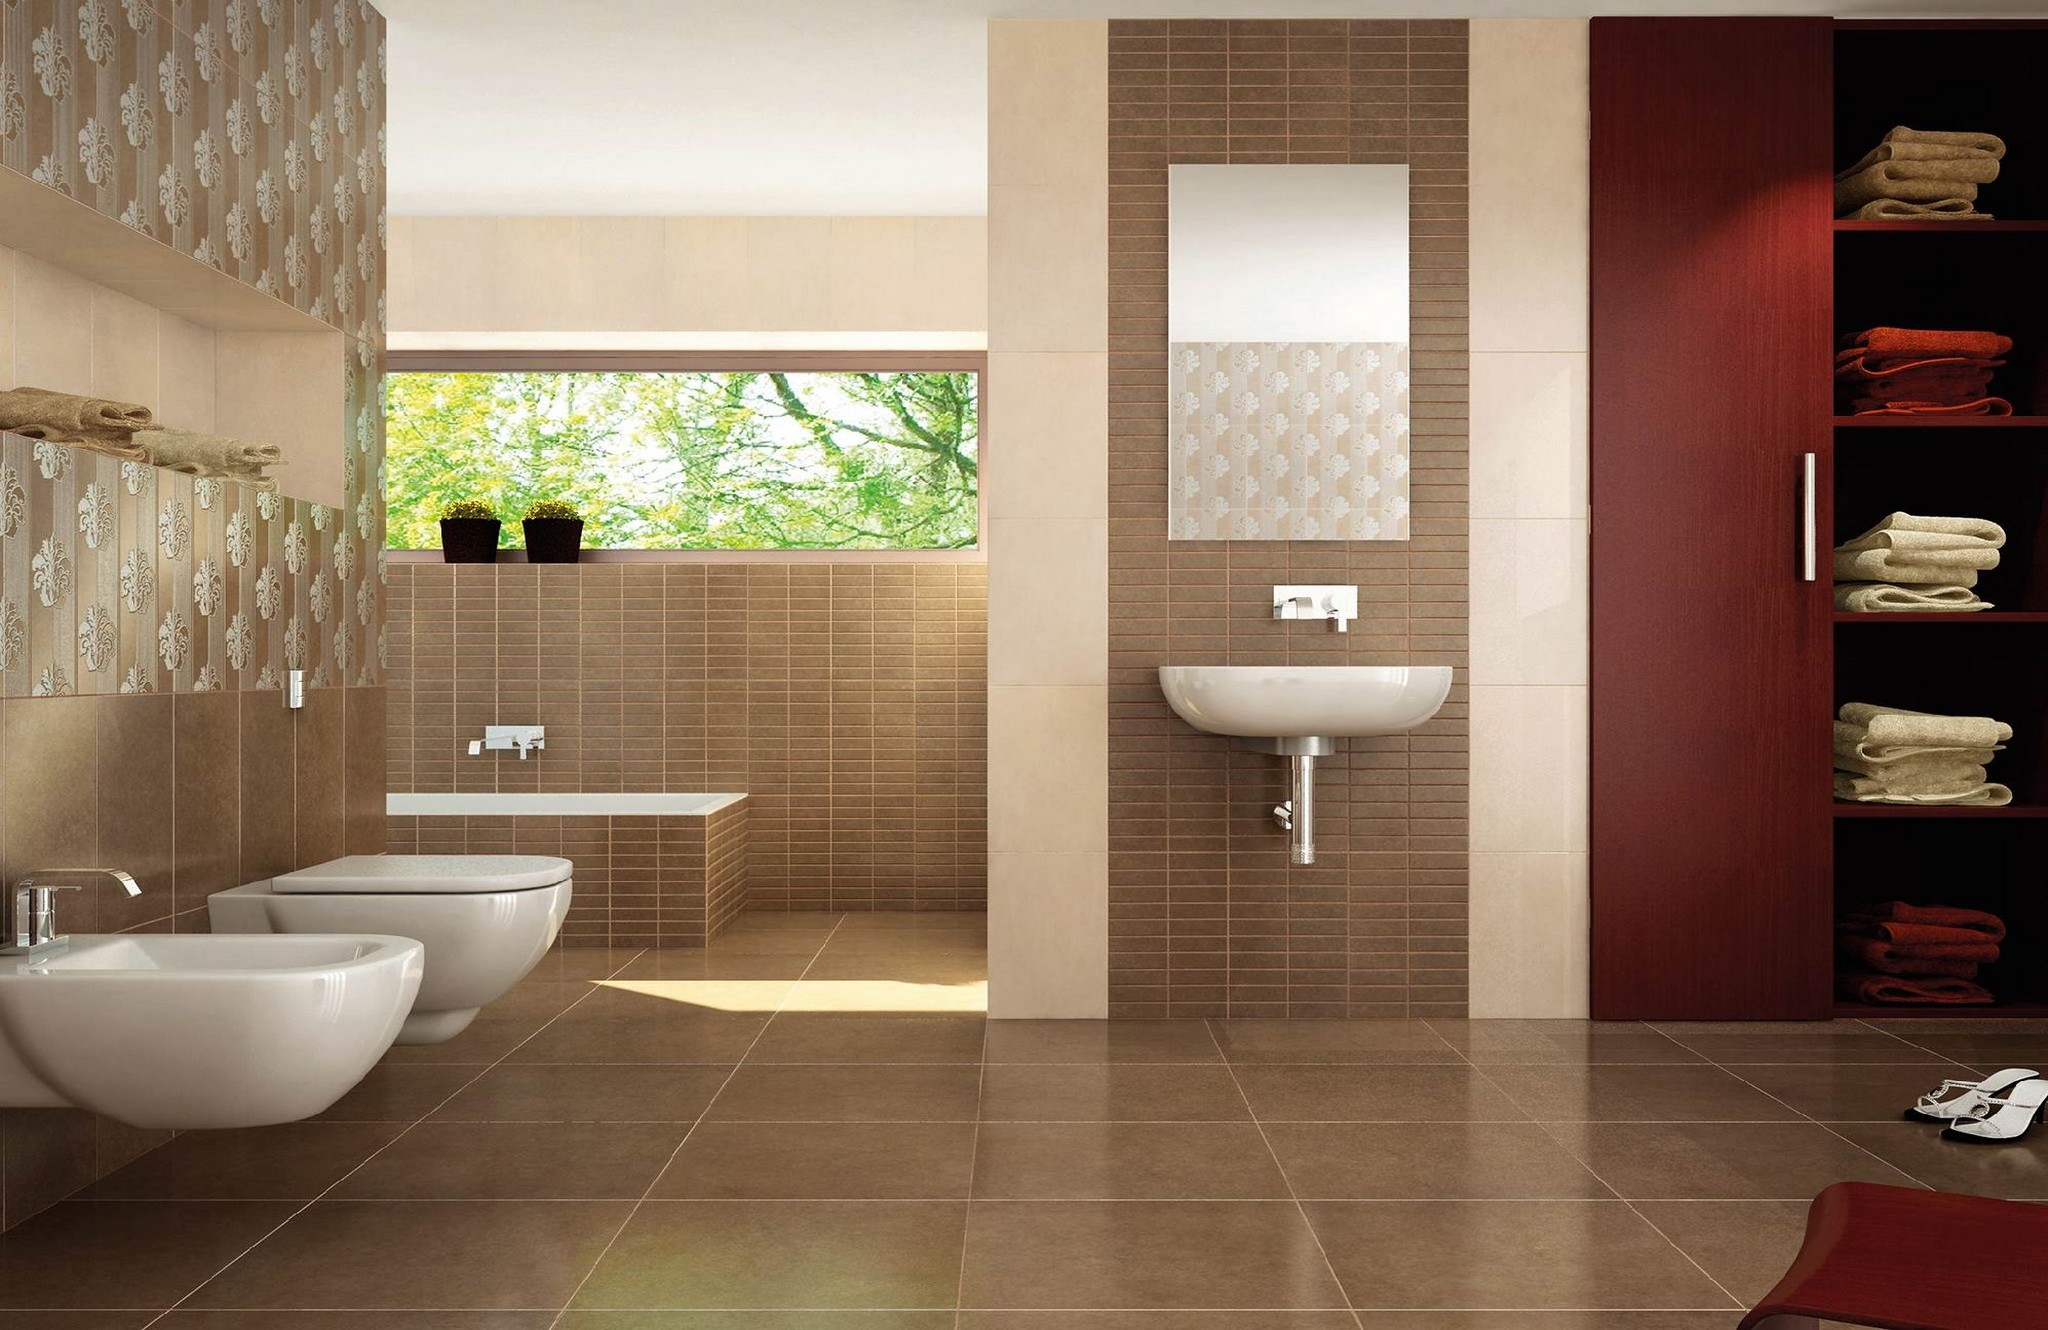 Faience salle de bain cifre serie boston 25x40 1 choix carrelage fa ence salle de bain - Carrelage pour salle de bain moderne ...